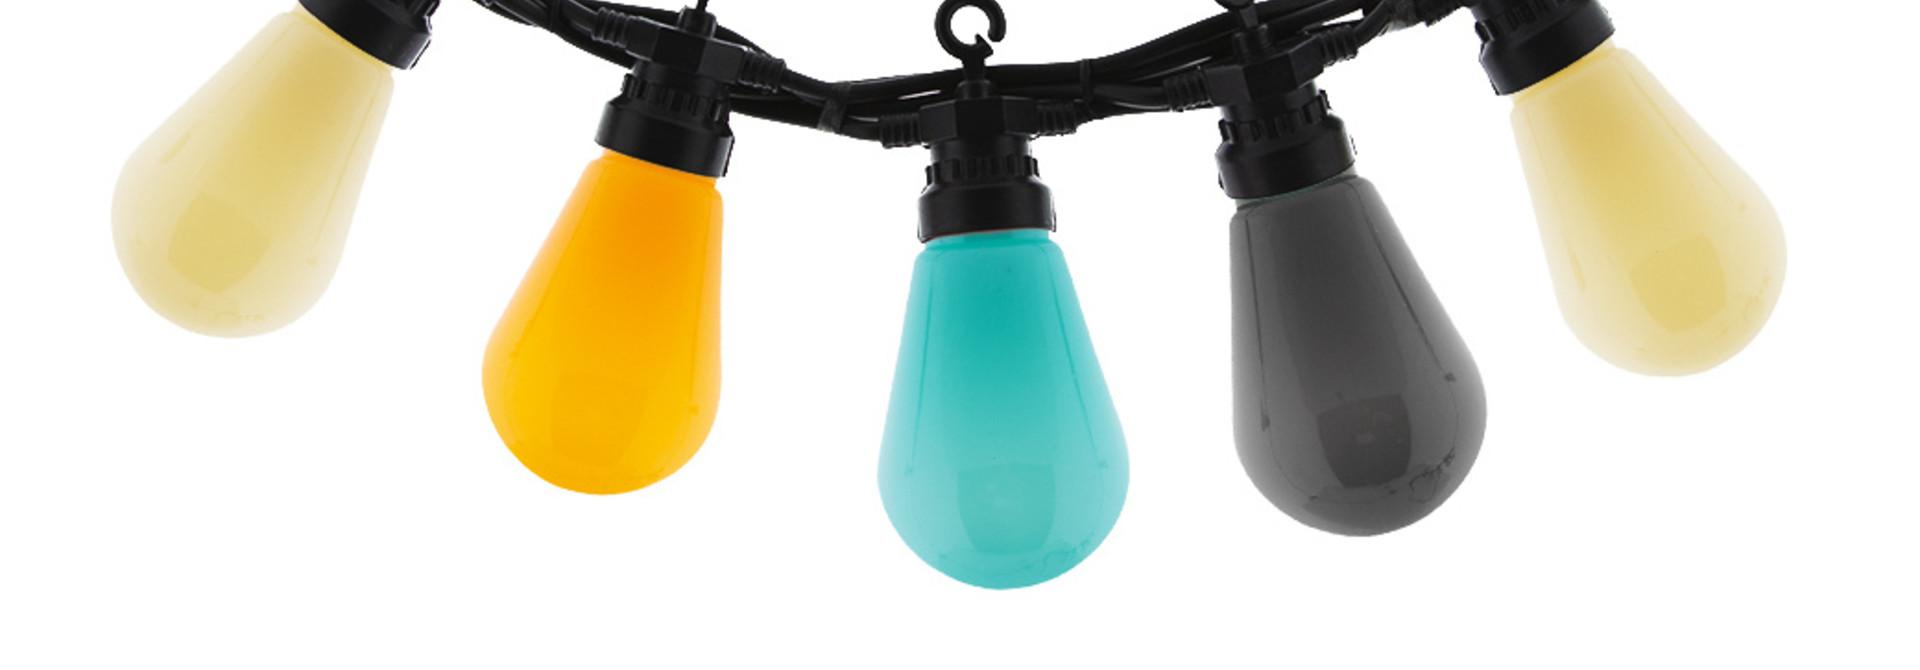 Regular Patio Lights Edison Bulbs - Beach